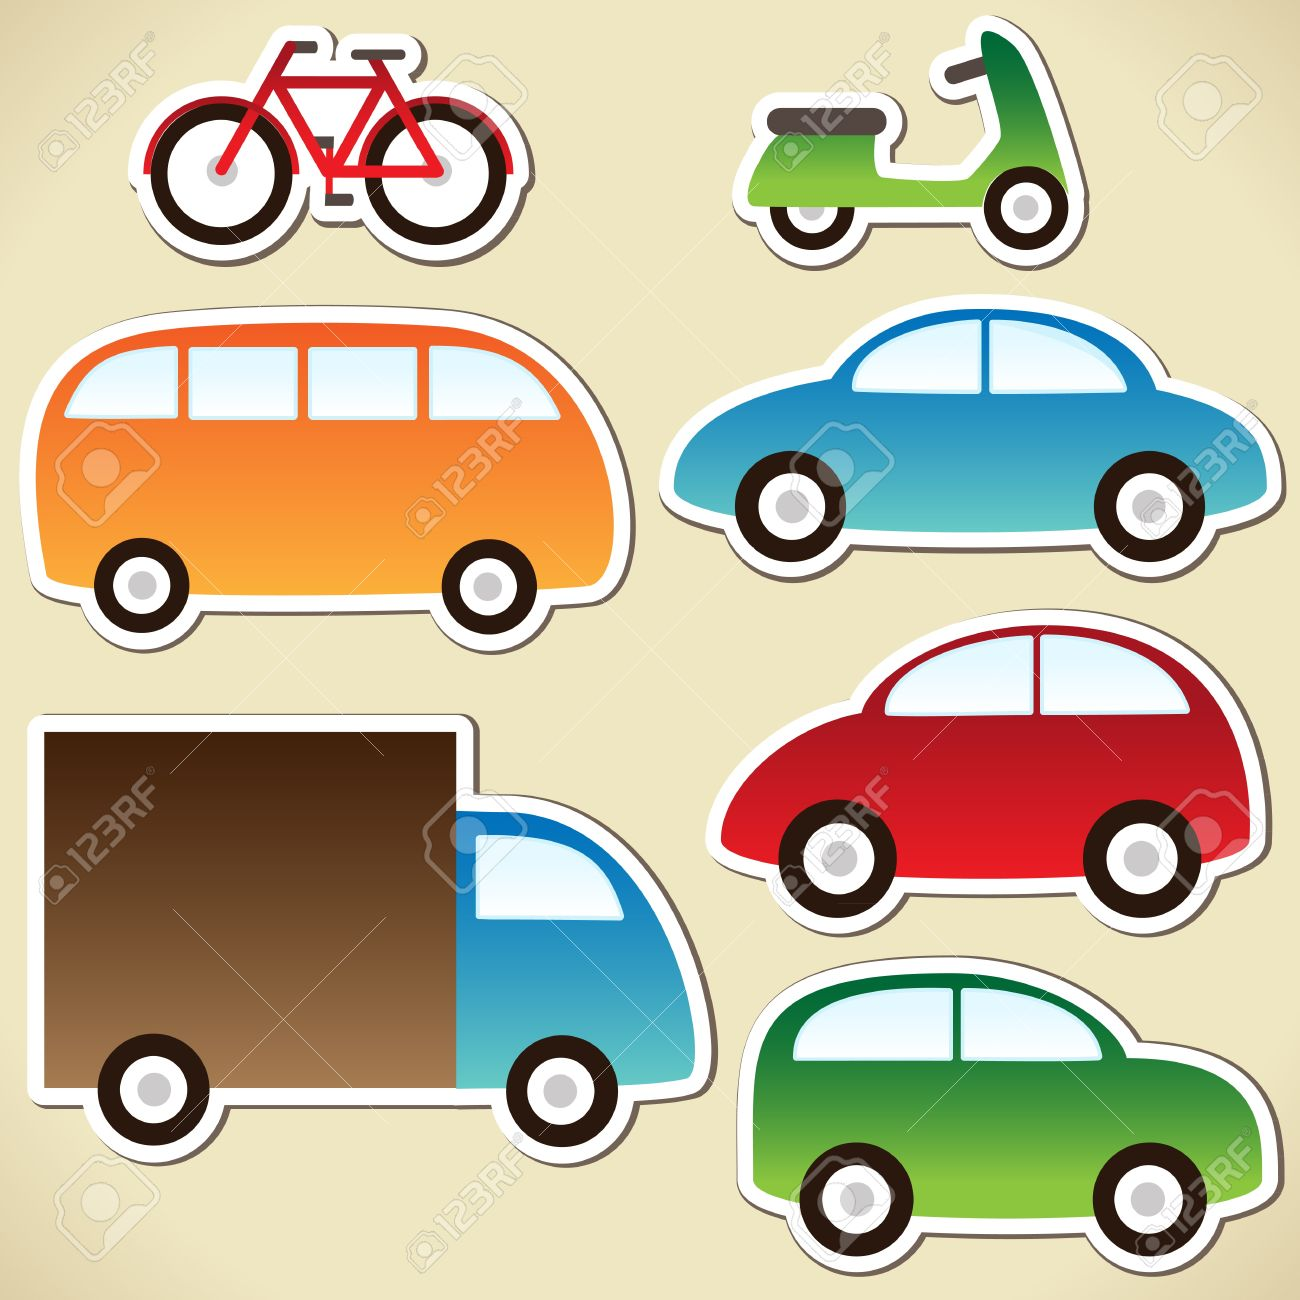 Transport set with cartoon cars - 13297203